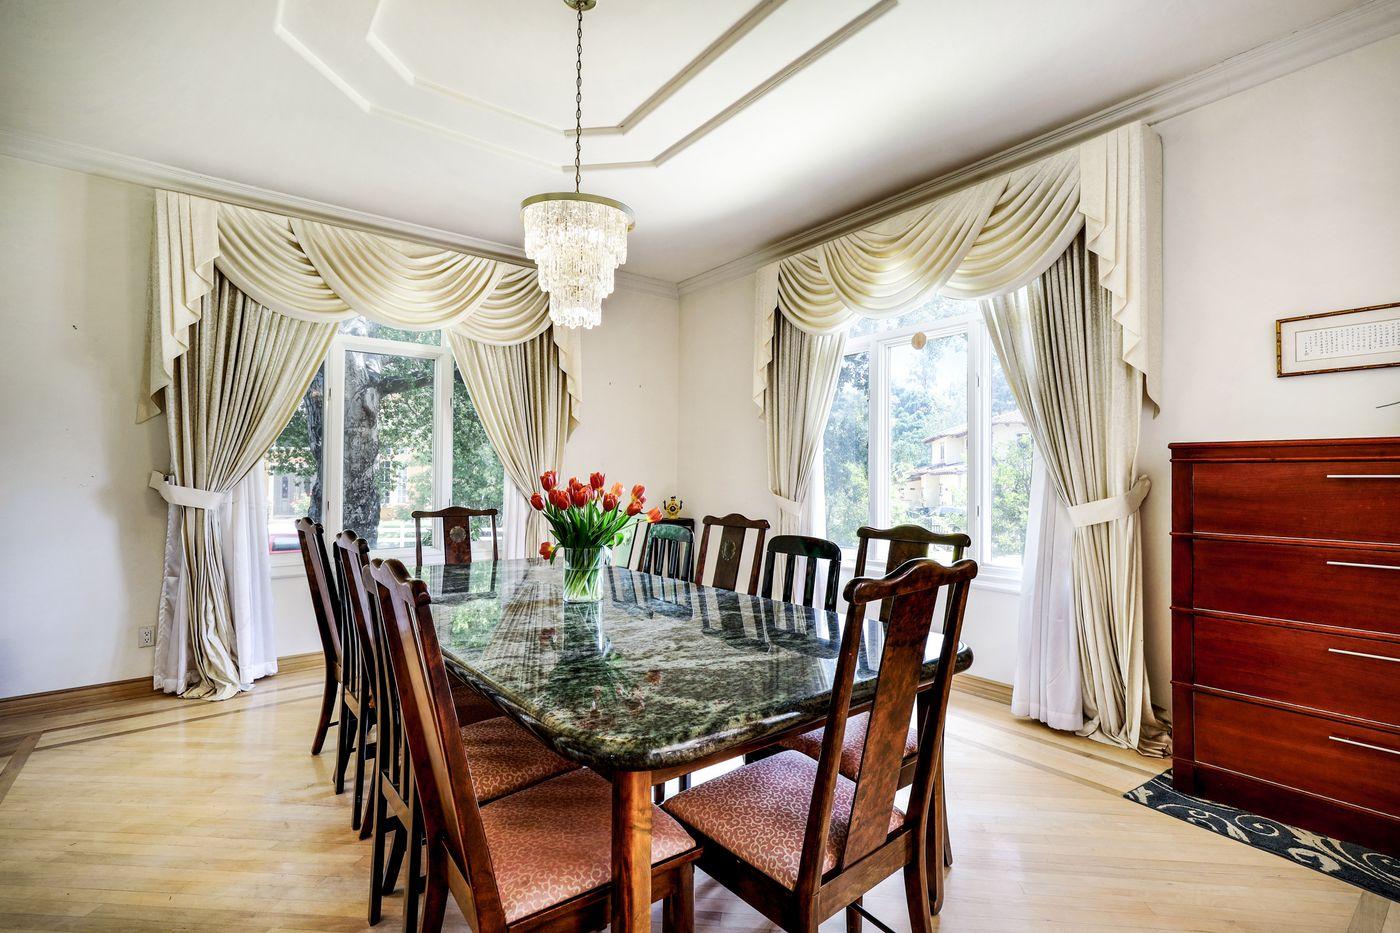 real-estate-photography-2245 Kingsbridge Ct-San Dimas-91773-airbnb-rental-interior-design-photographer-kasi-hyrapett-22